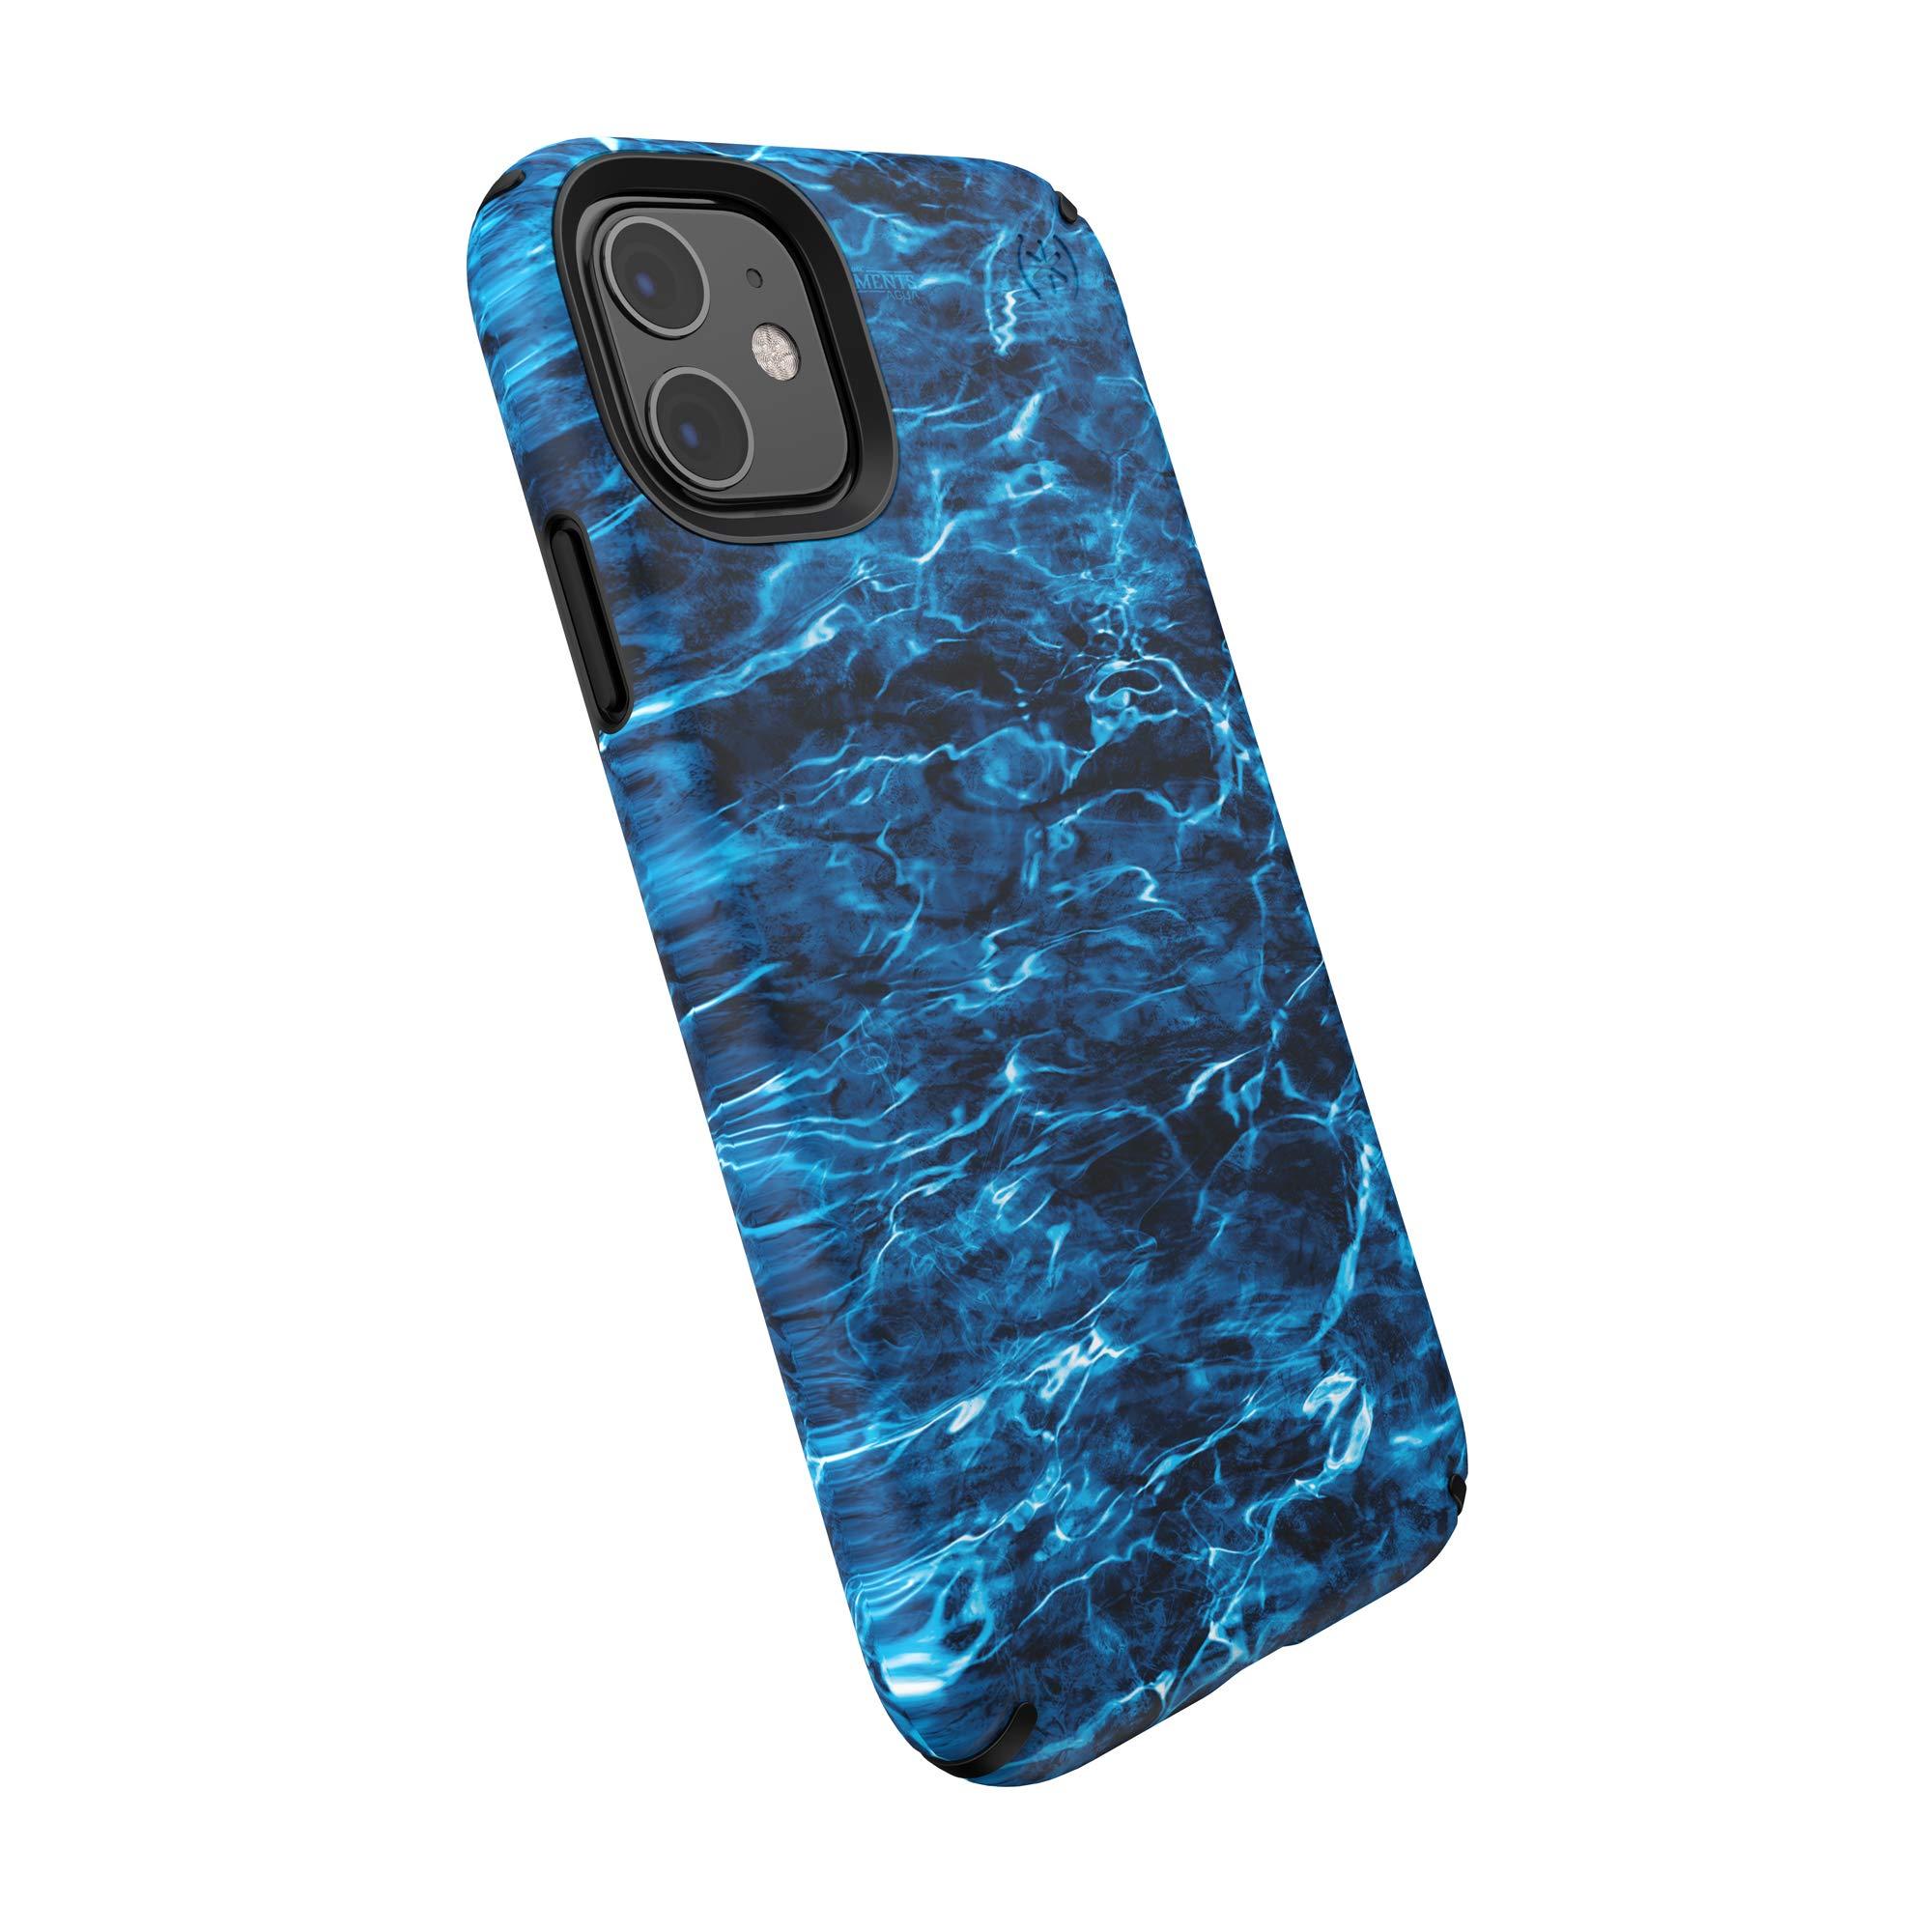 Speck Presidio Inked iPhone 11 Case, Mossy Oak Elements Agua Marlin/Black